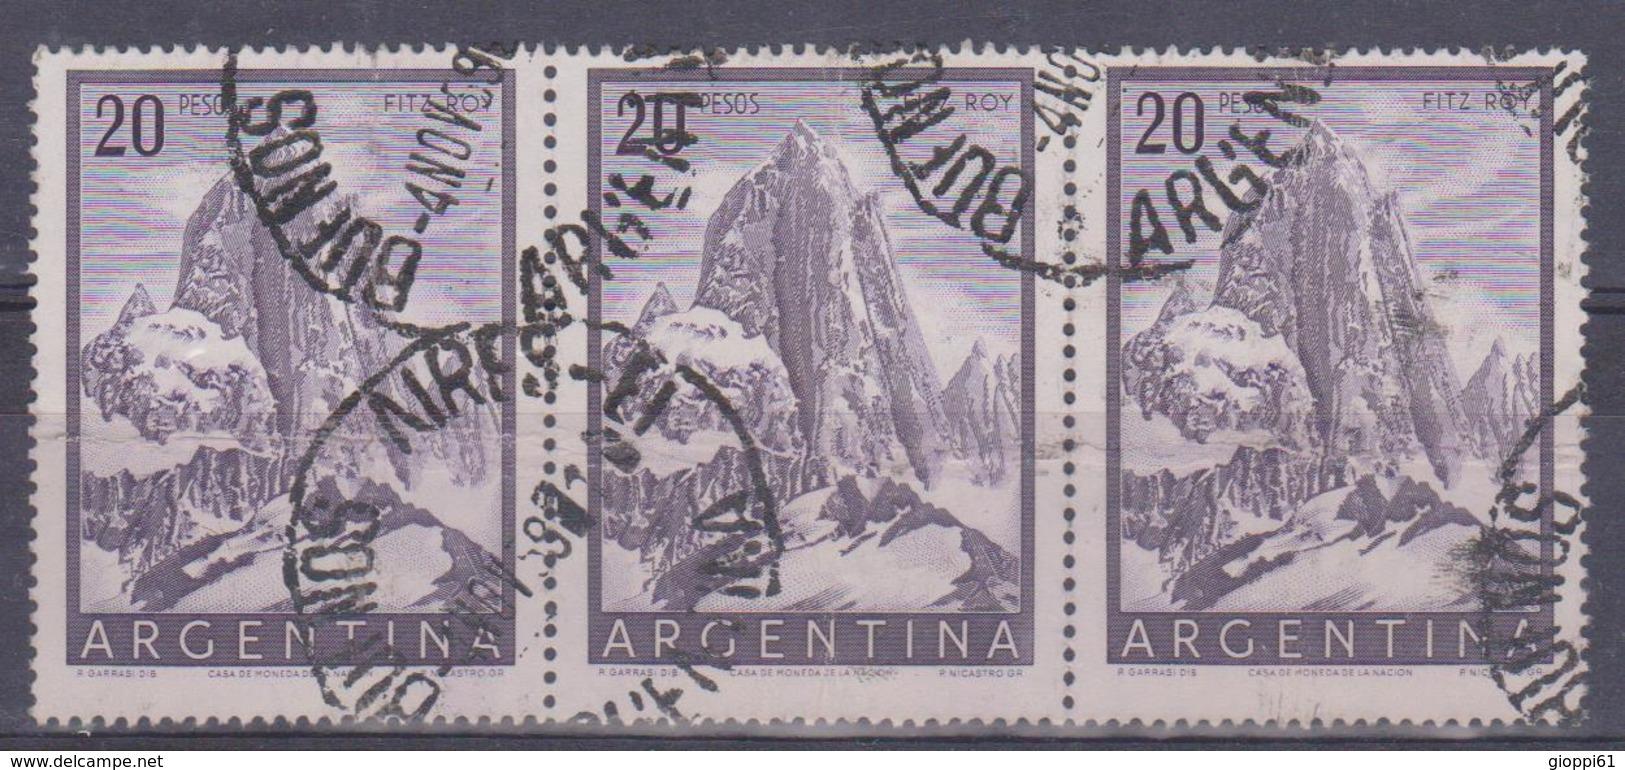 Argentina - Monte Fitz Roy - Argentina